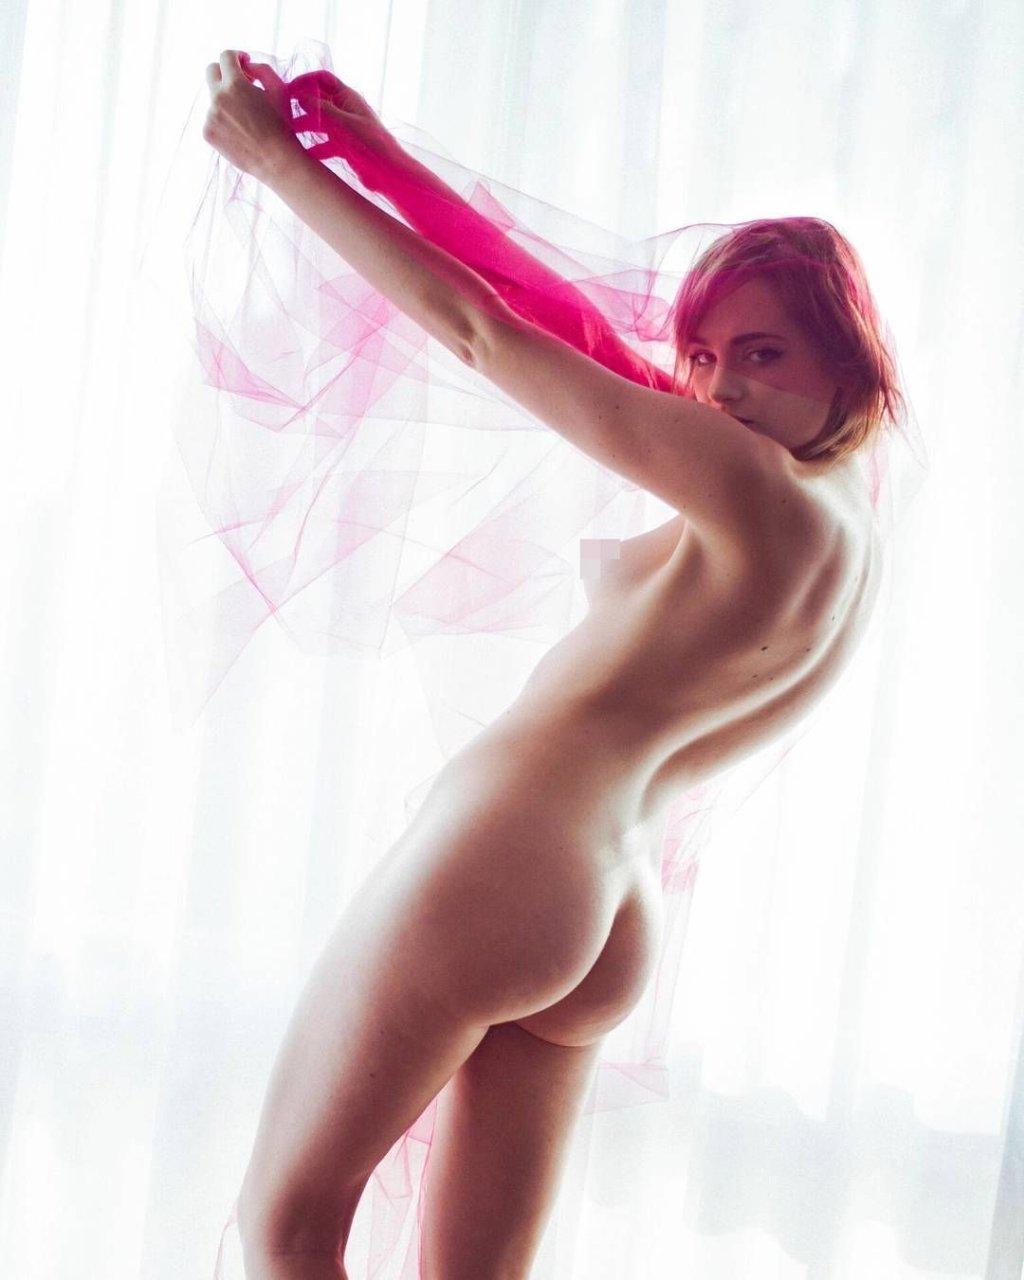 Erin eevee nude new photo gallery and pics